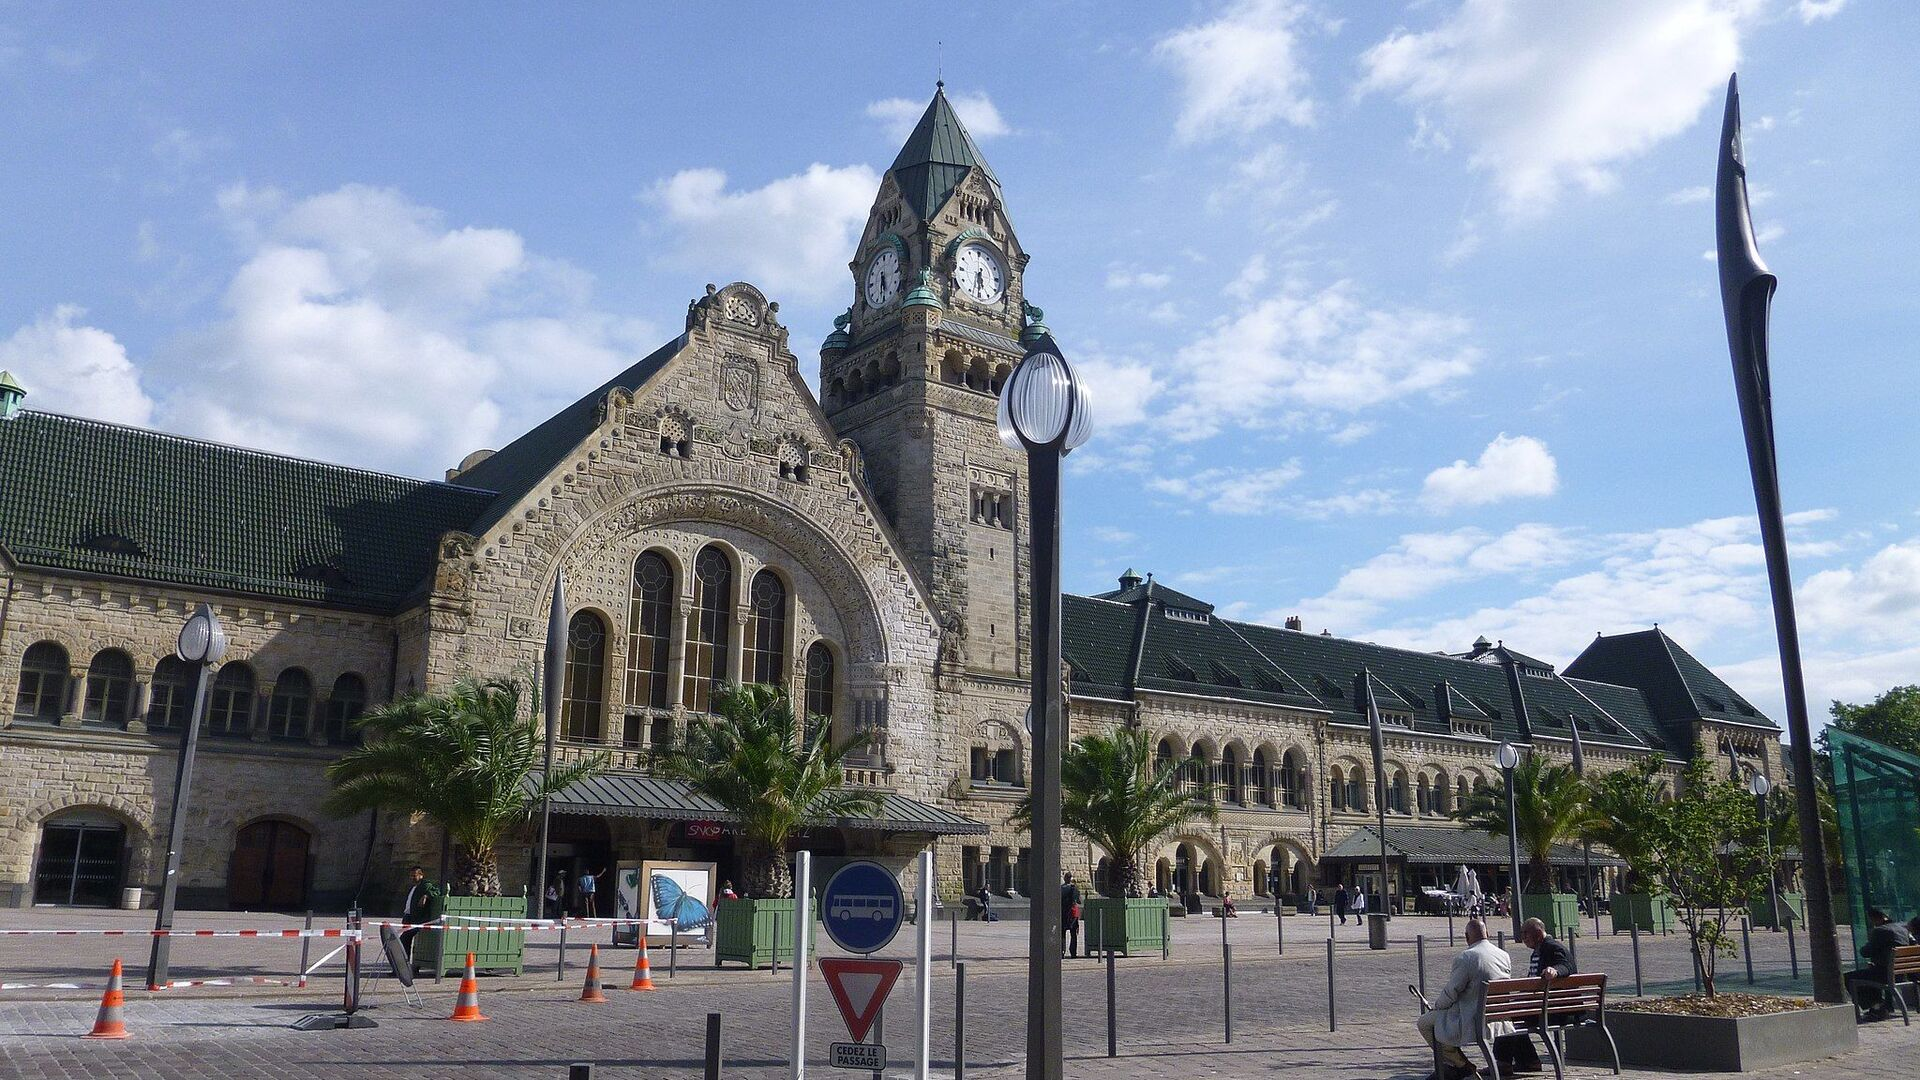 Metz, capoluogo della Mosella, Francia - Sputnik Italia, 1920, 09.08.2021